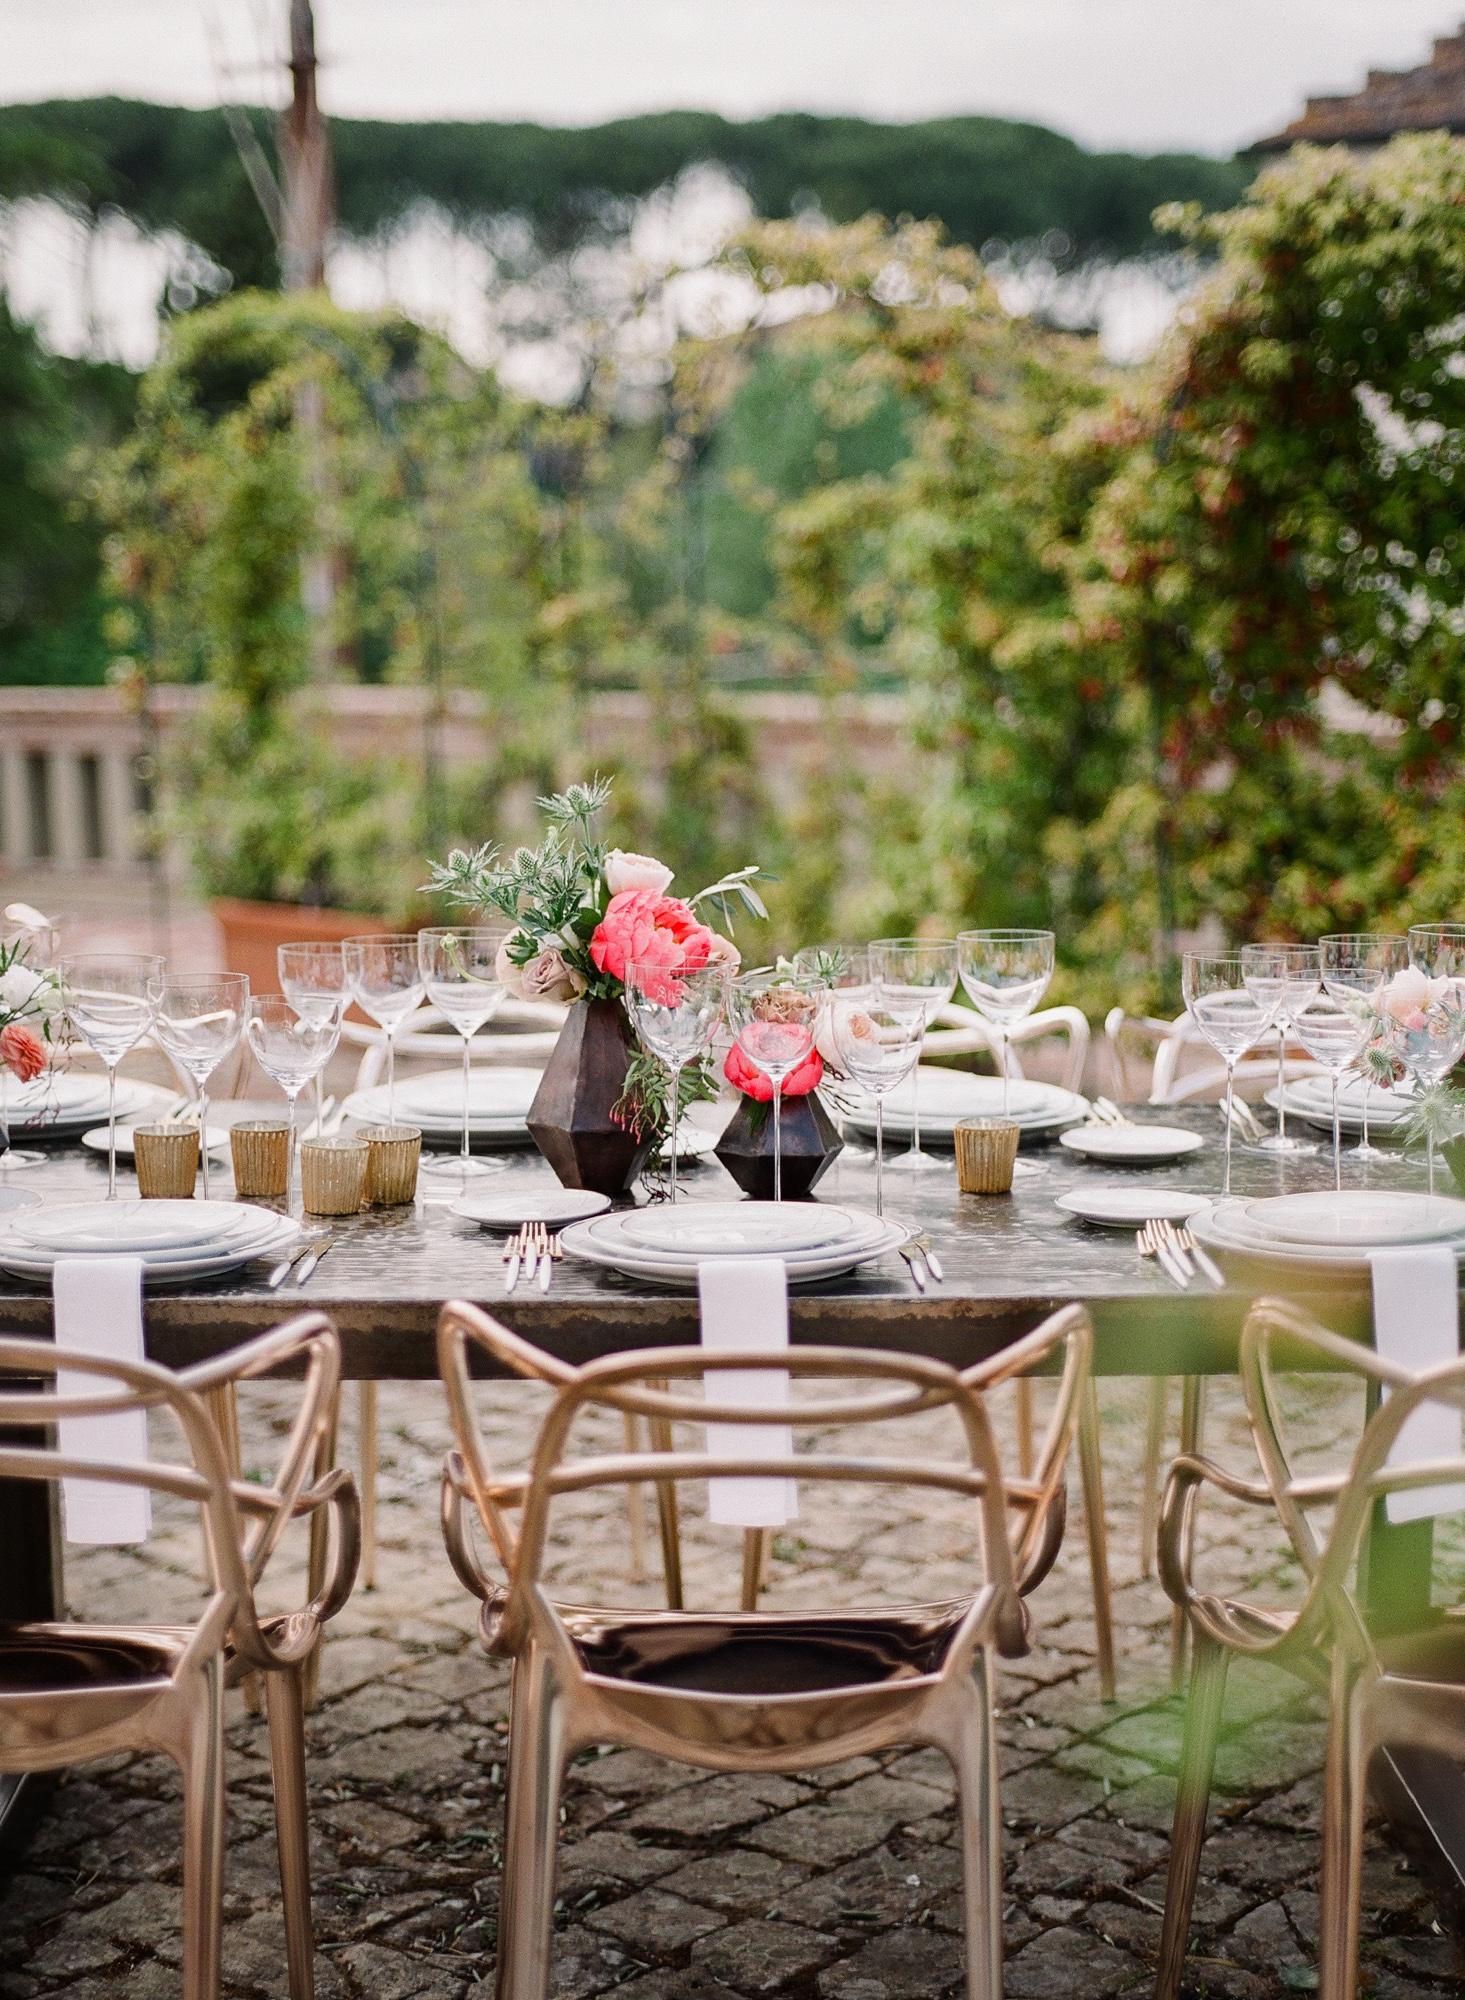 Tuscany-Wedding-Venues-45.jpg